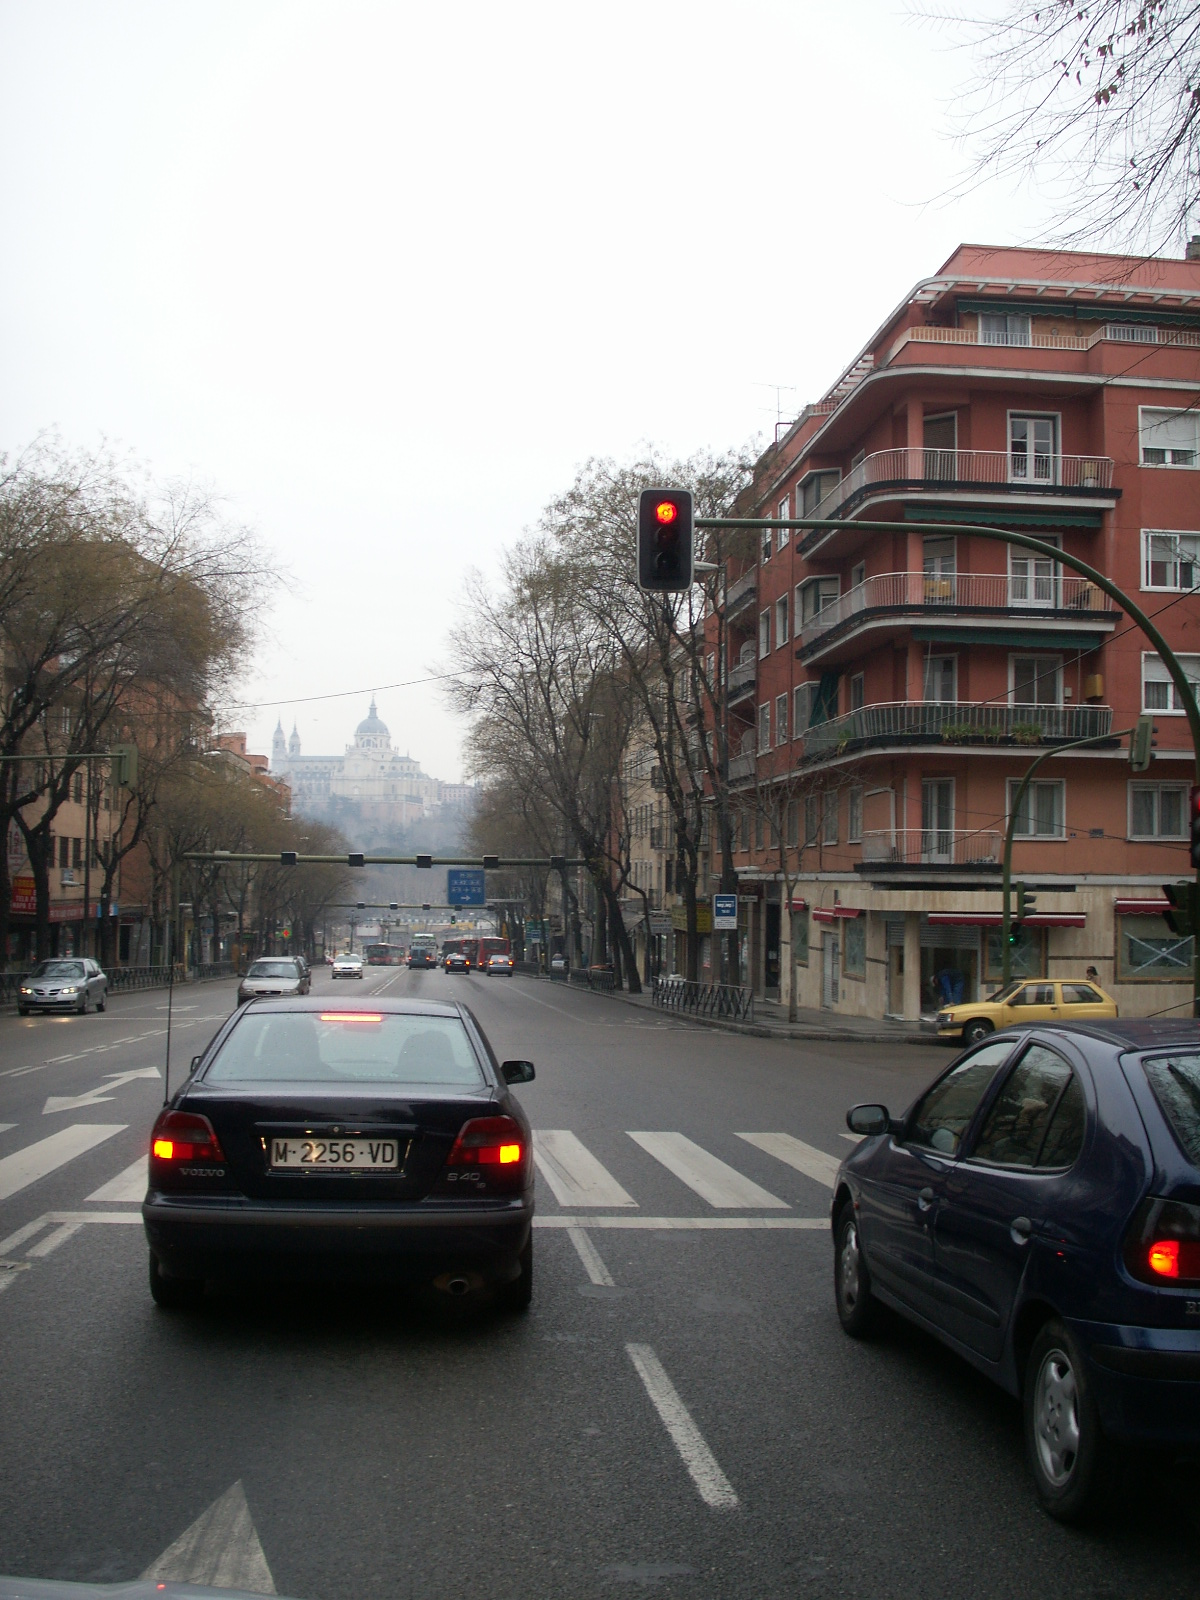 Paseo por la calle en brasil 7 - 2 2